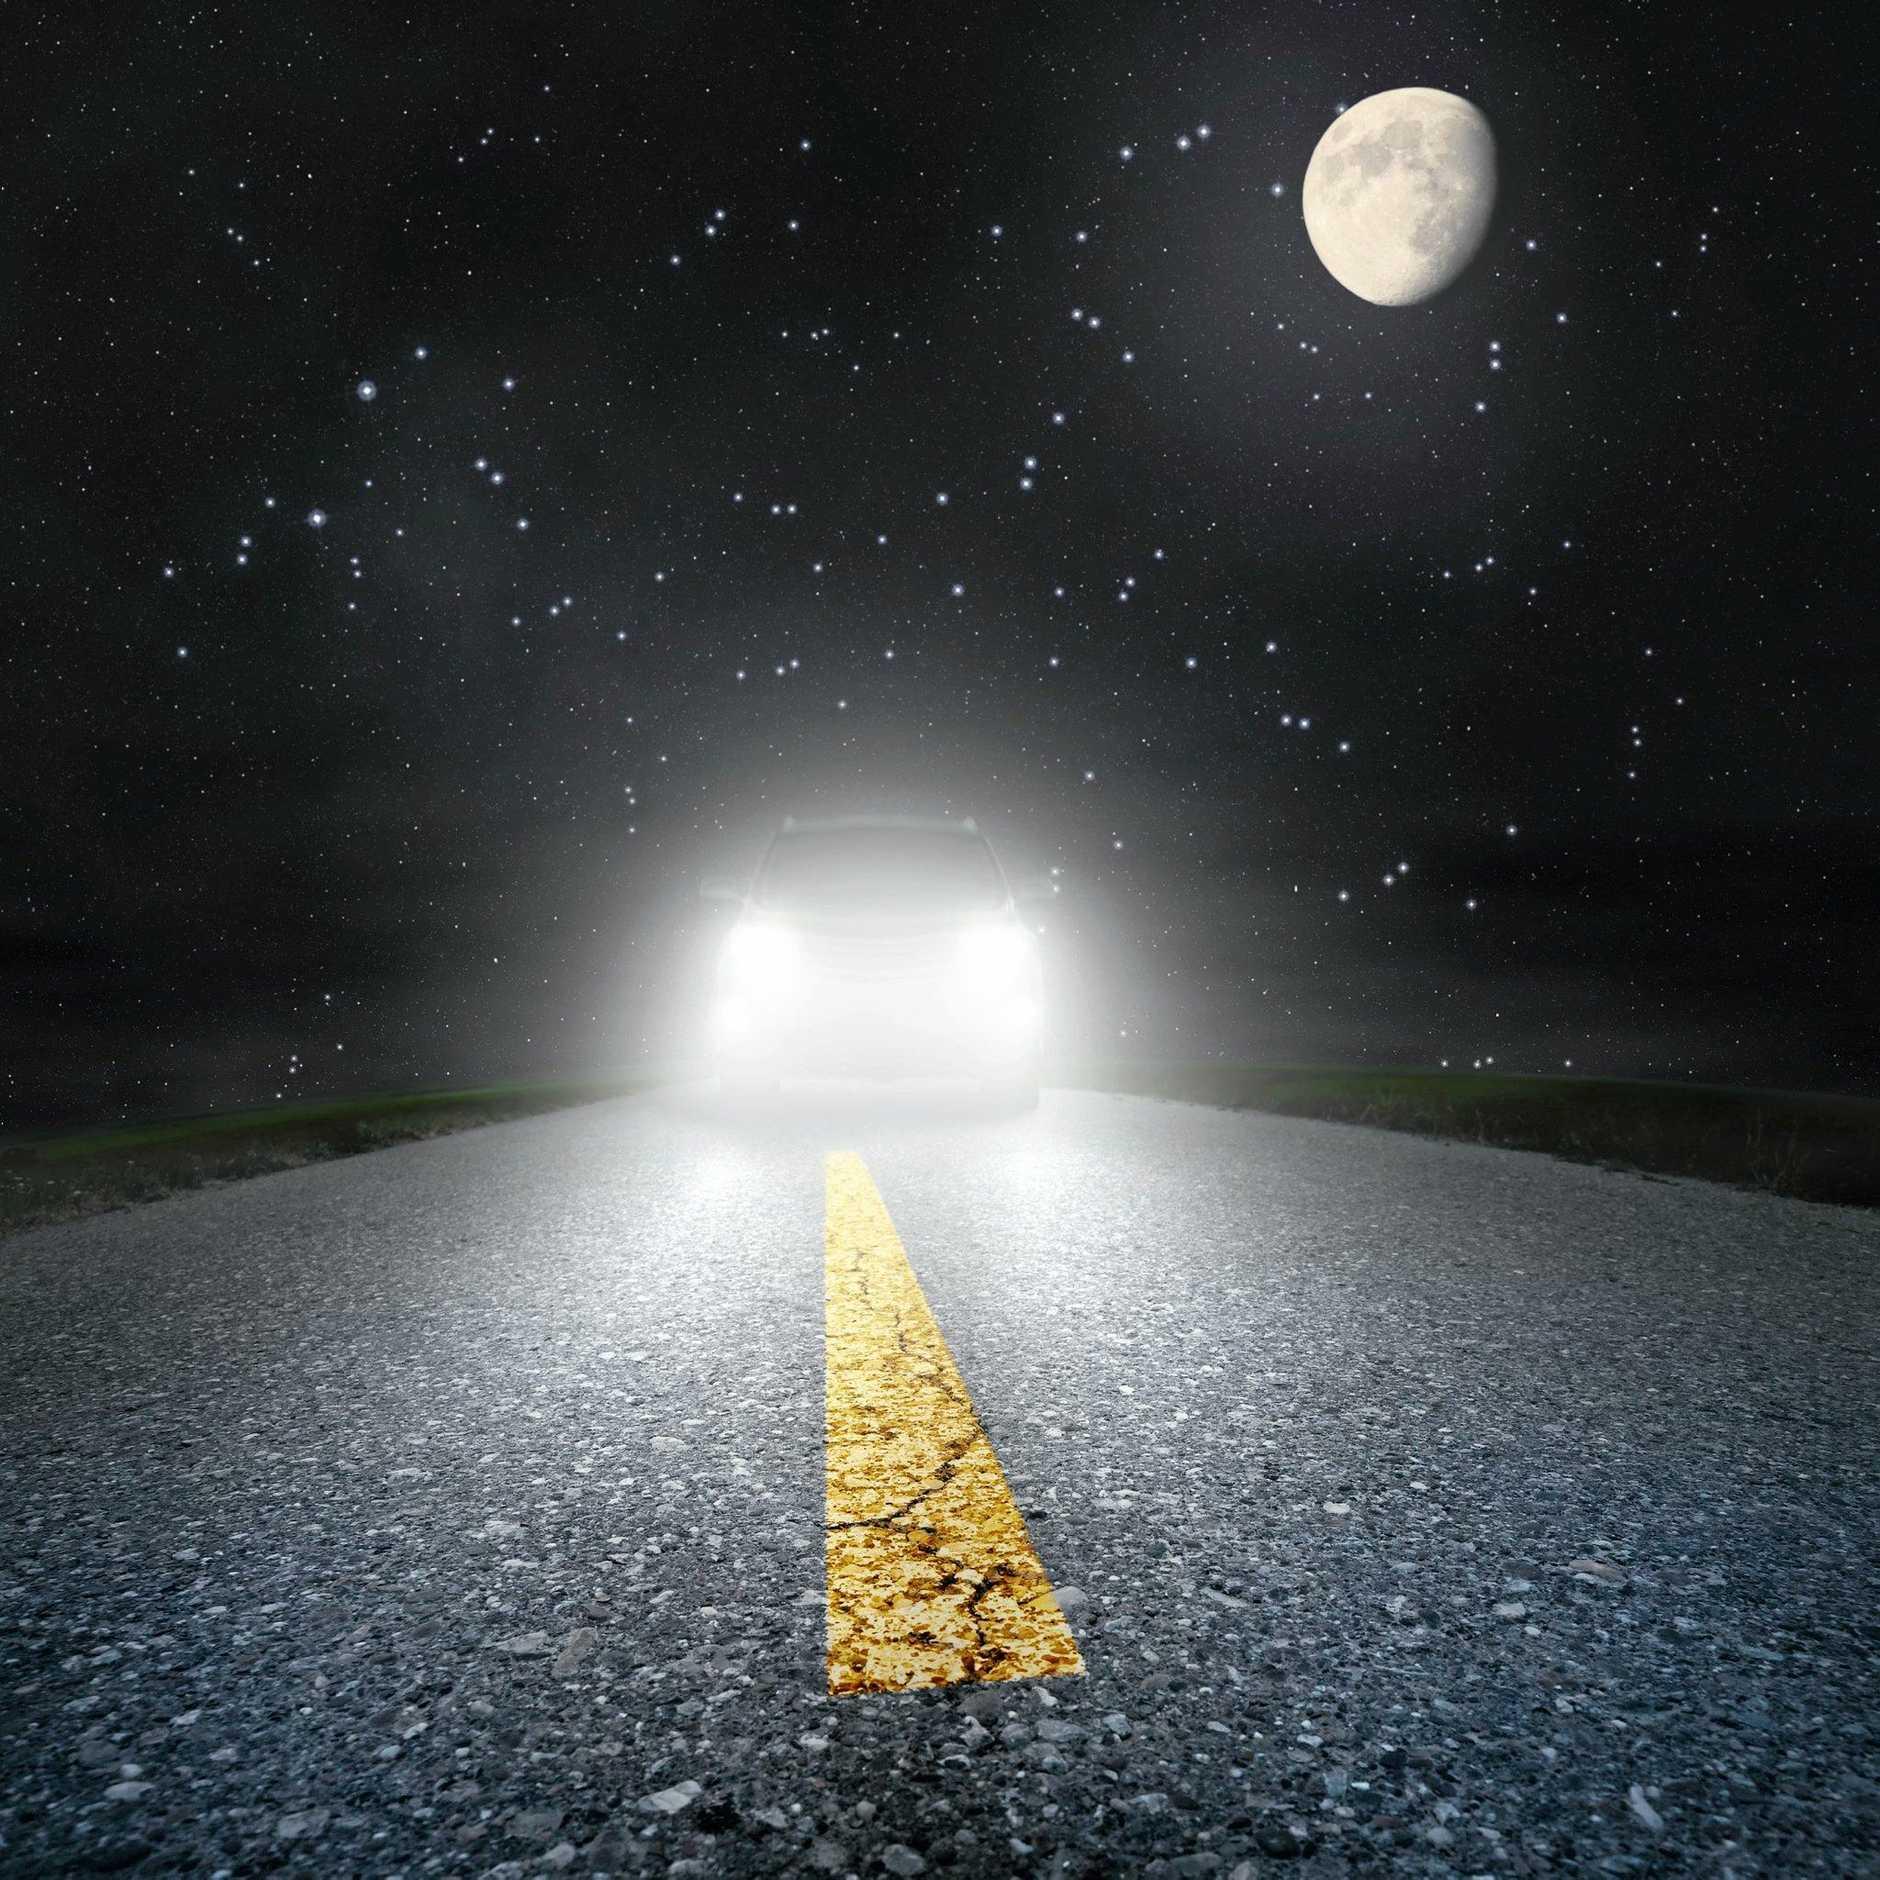 Night driving on an asphalt road towards the headlights